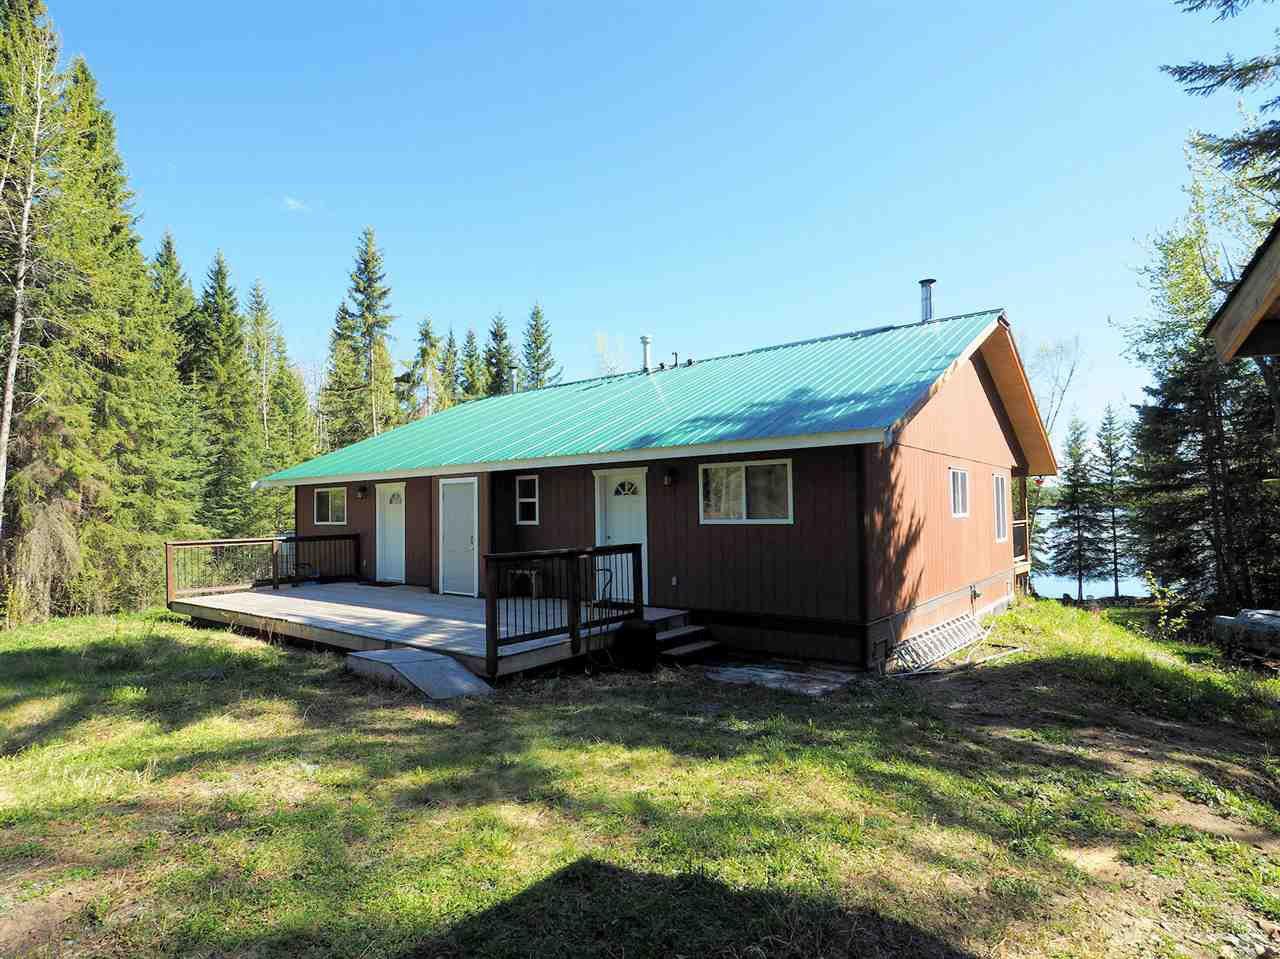 Photo 7: Photos: 8222 CENTENNIAL Road in Bridge Lake: Bridge Lake/Sheridan Lake House for sale (100 Mile House (Zone 10))  : MLS®# R2457362